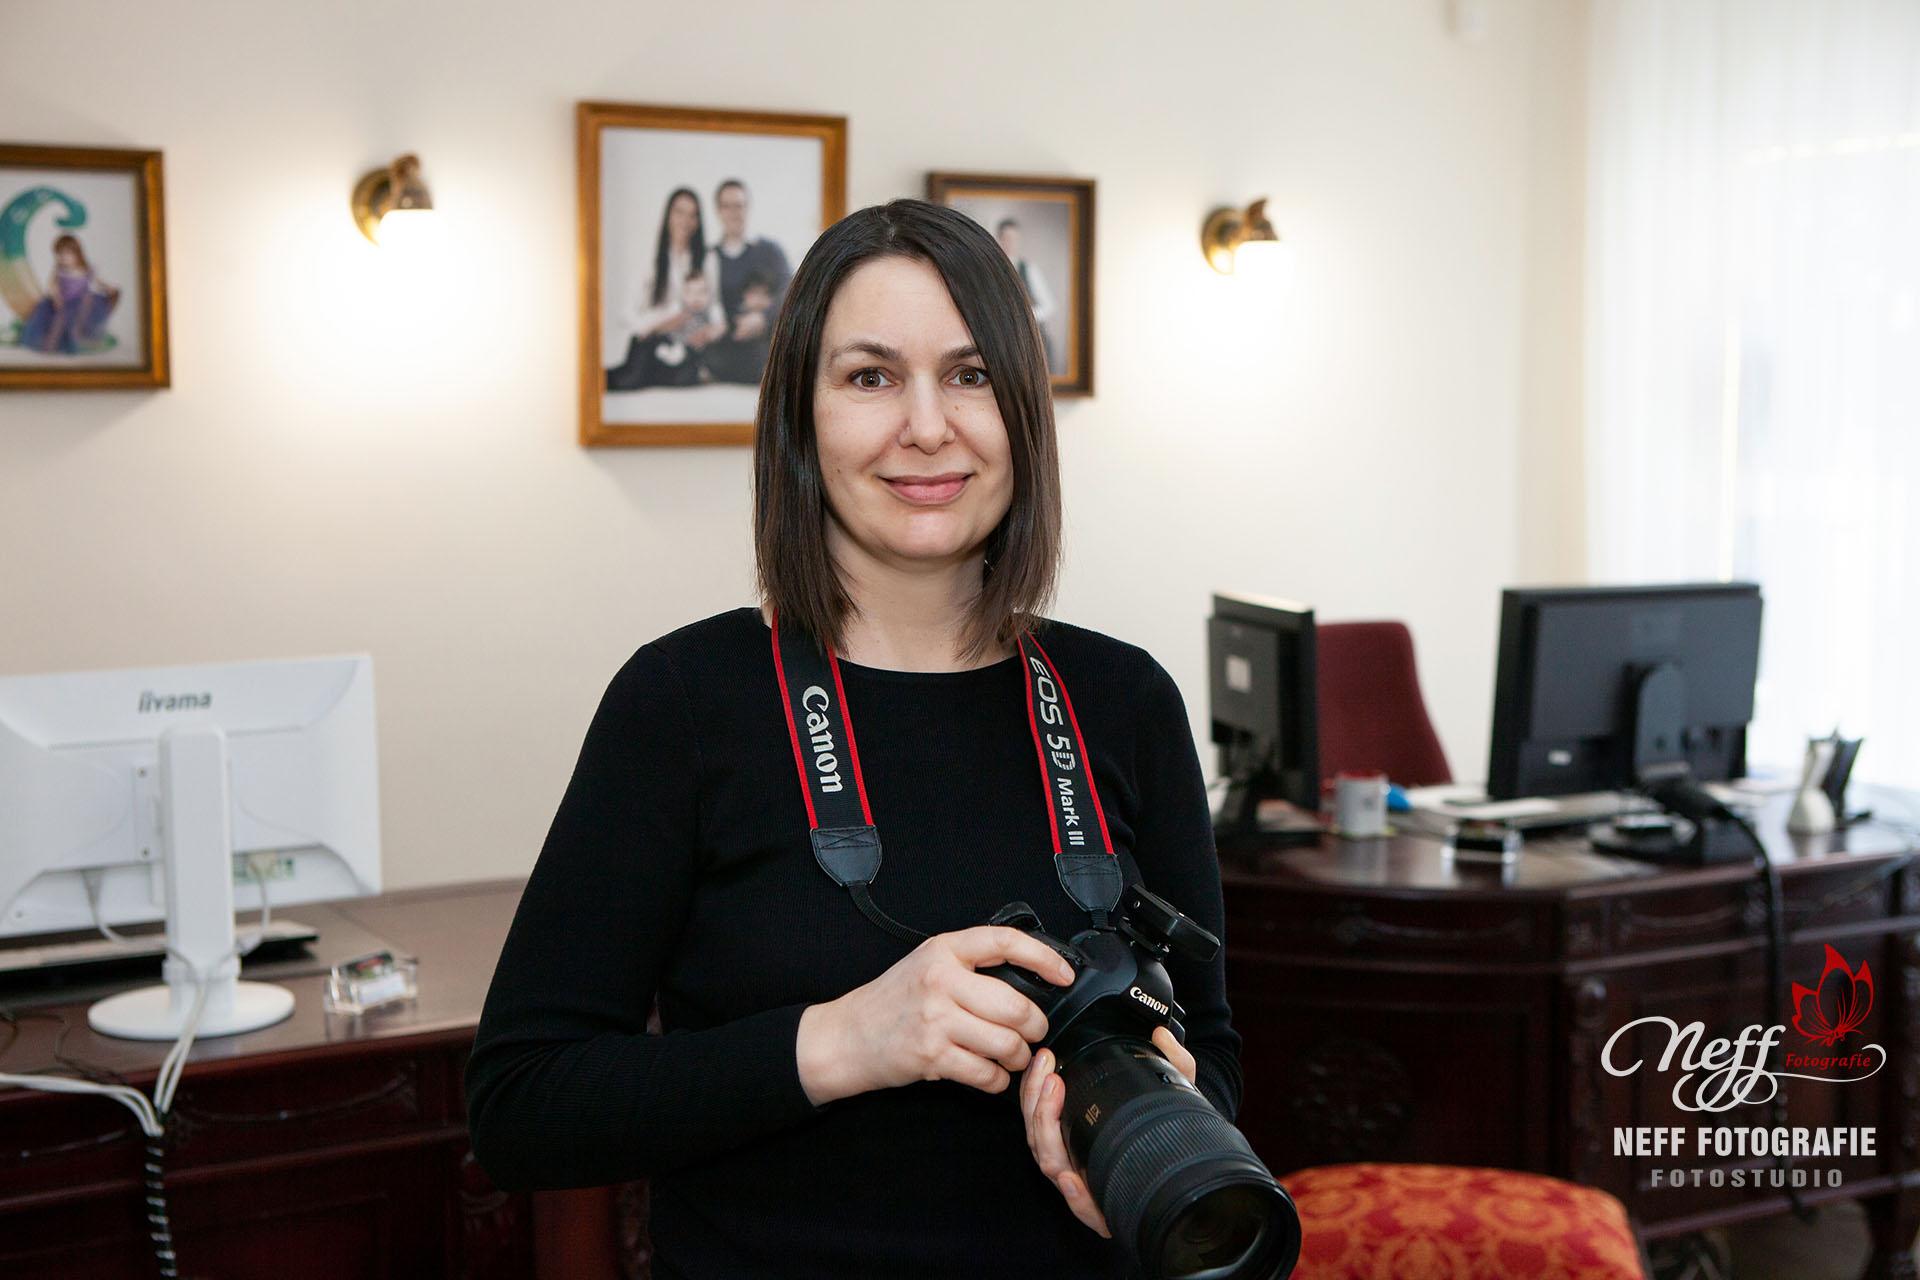 Gutes Passbild – guter Fotograf